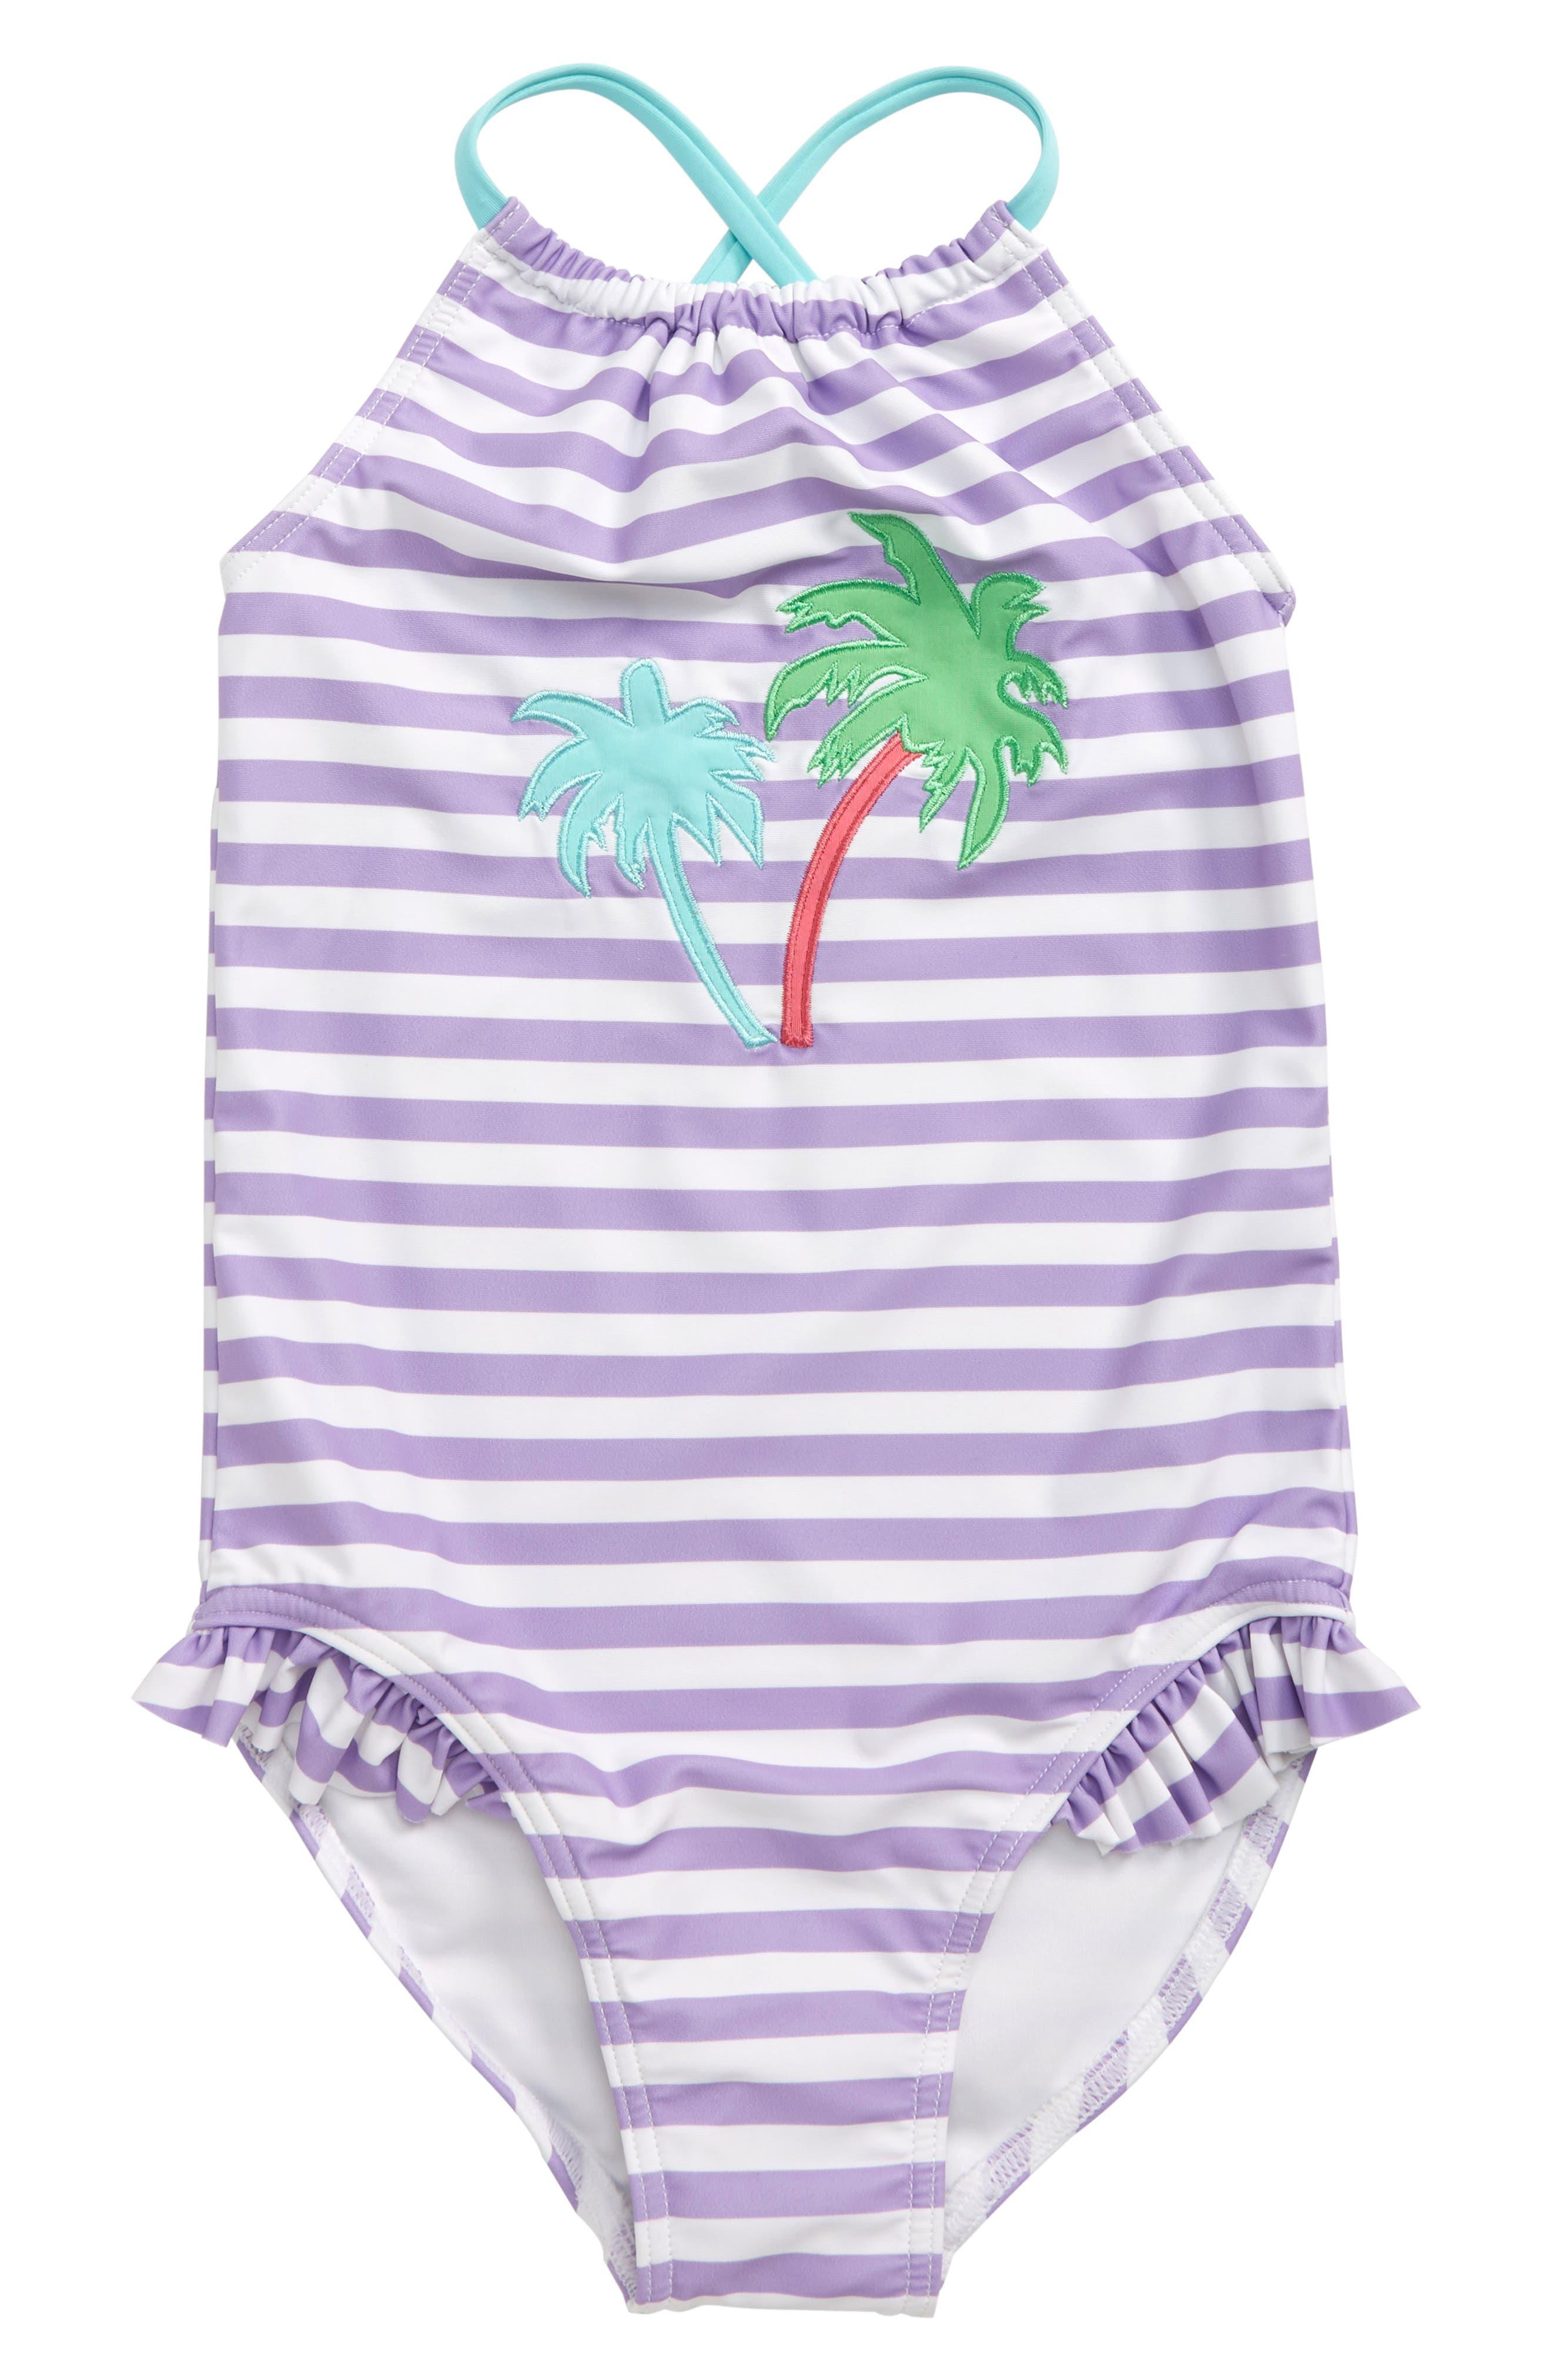 d8e8cc280ae7c Tucker + Tate - Girls' Swimwear and Beachwear